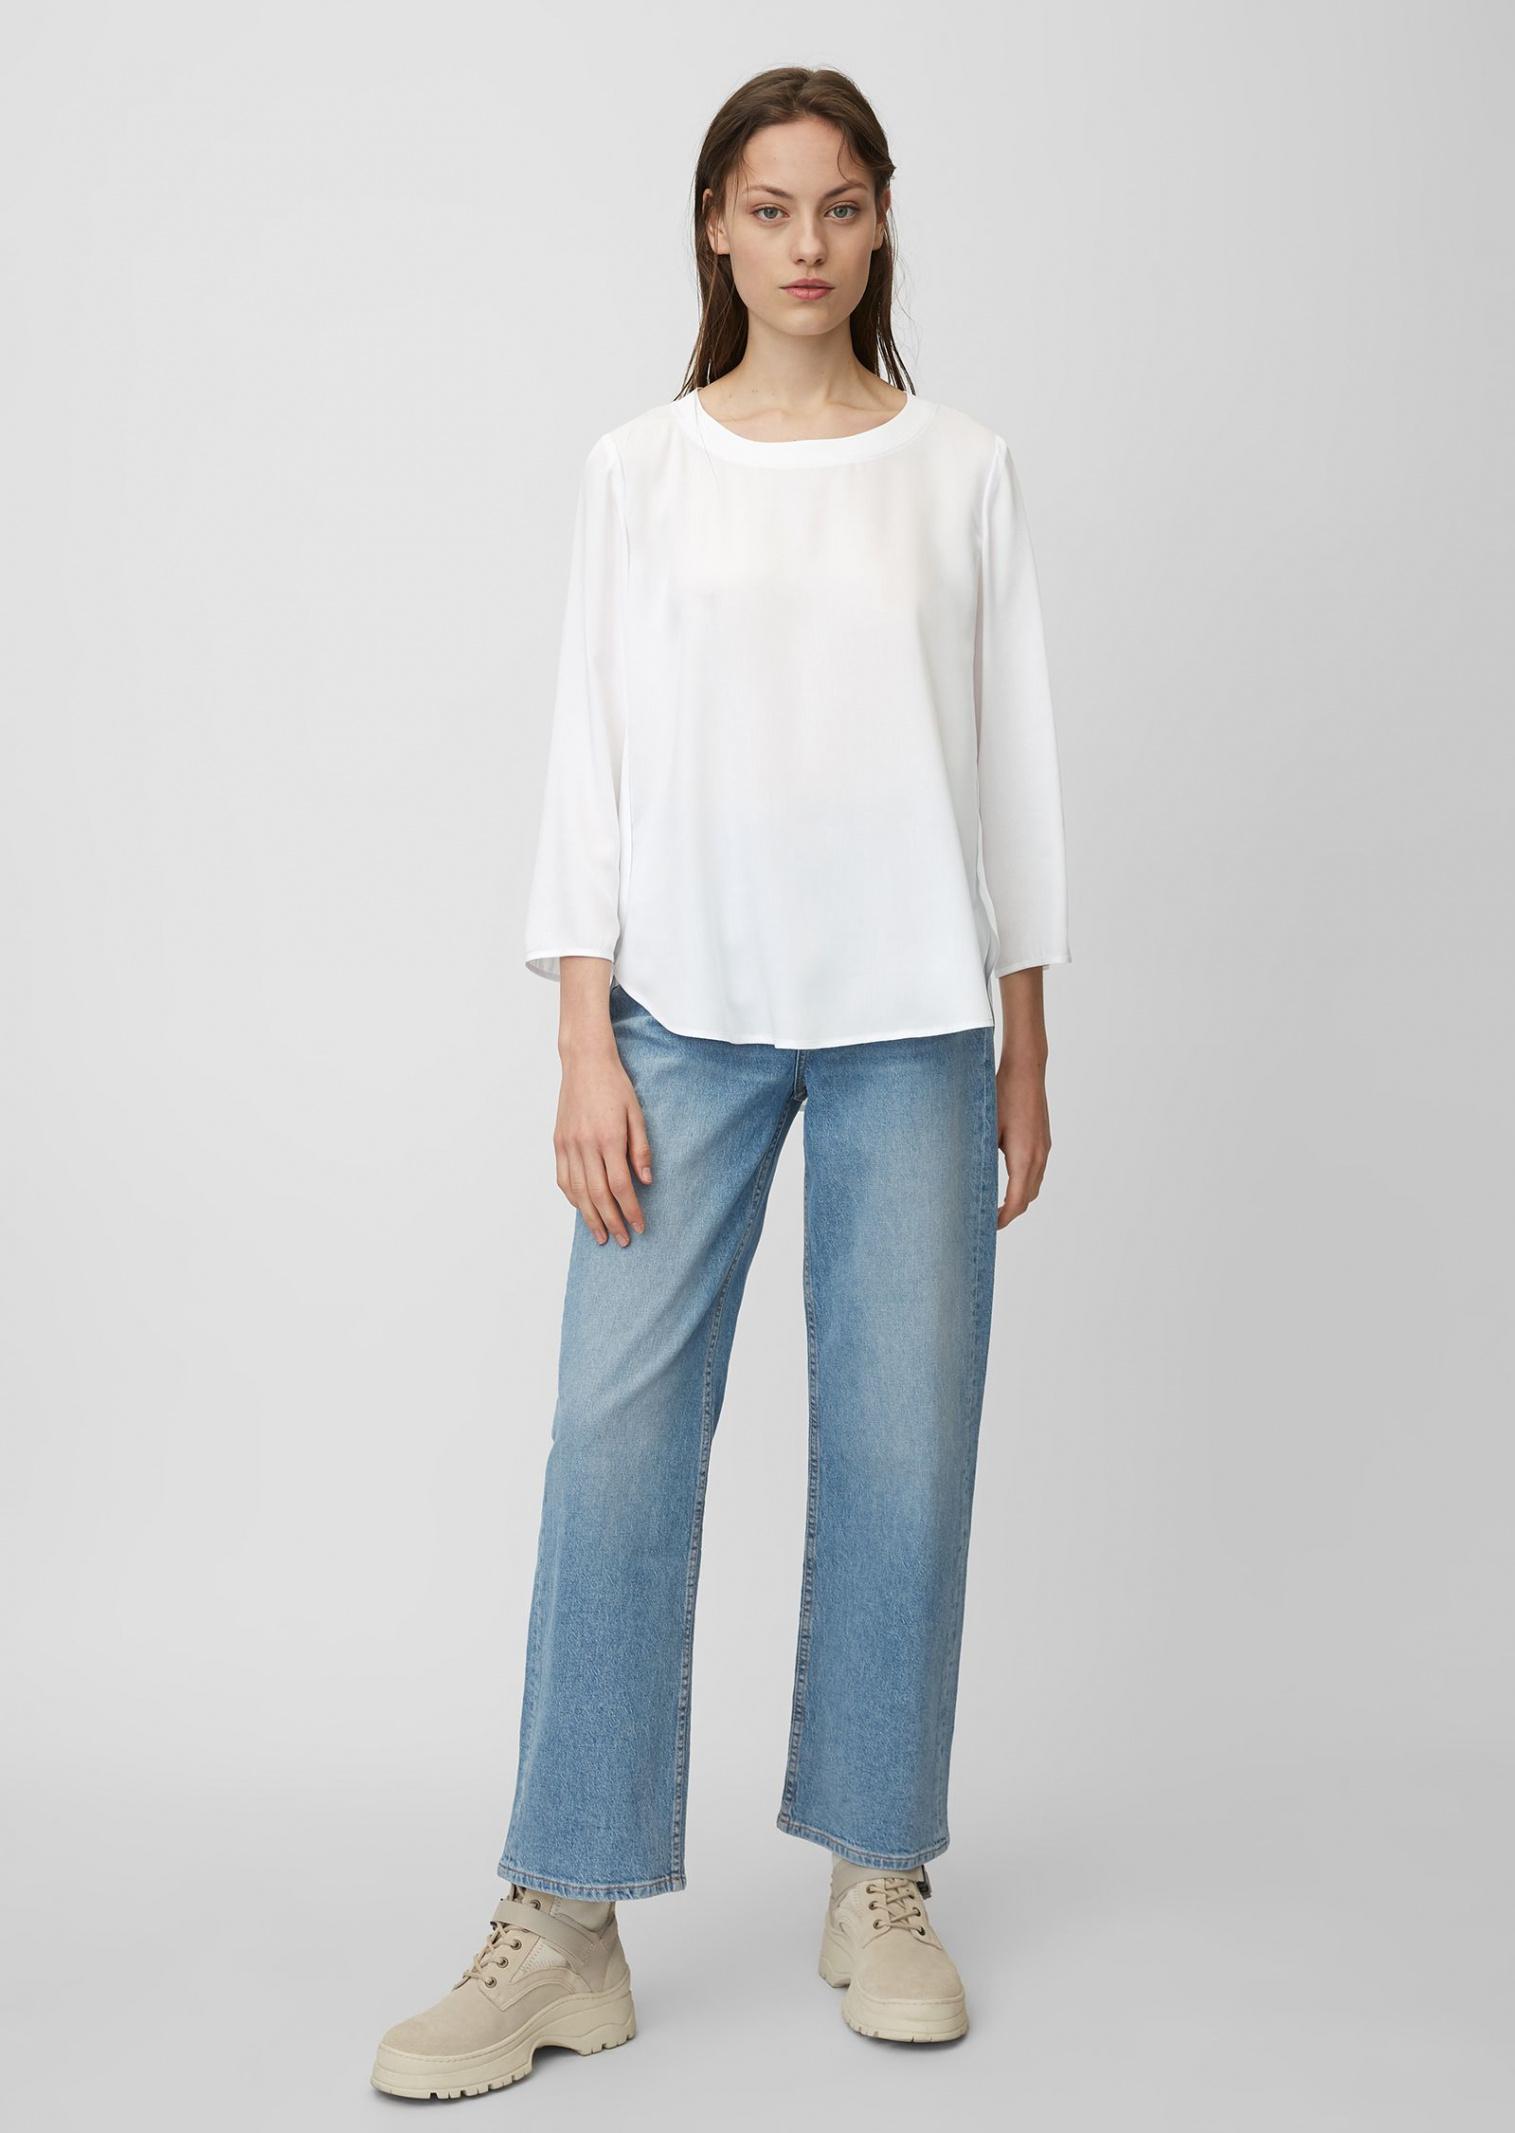 Блуза женские MARC O'POLO модель PF3982 качество, 2017